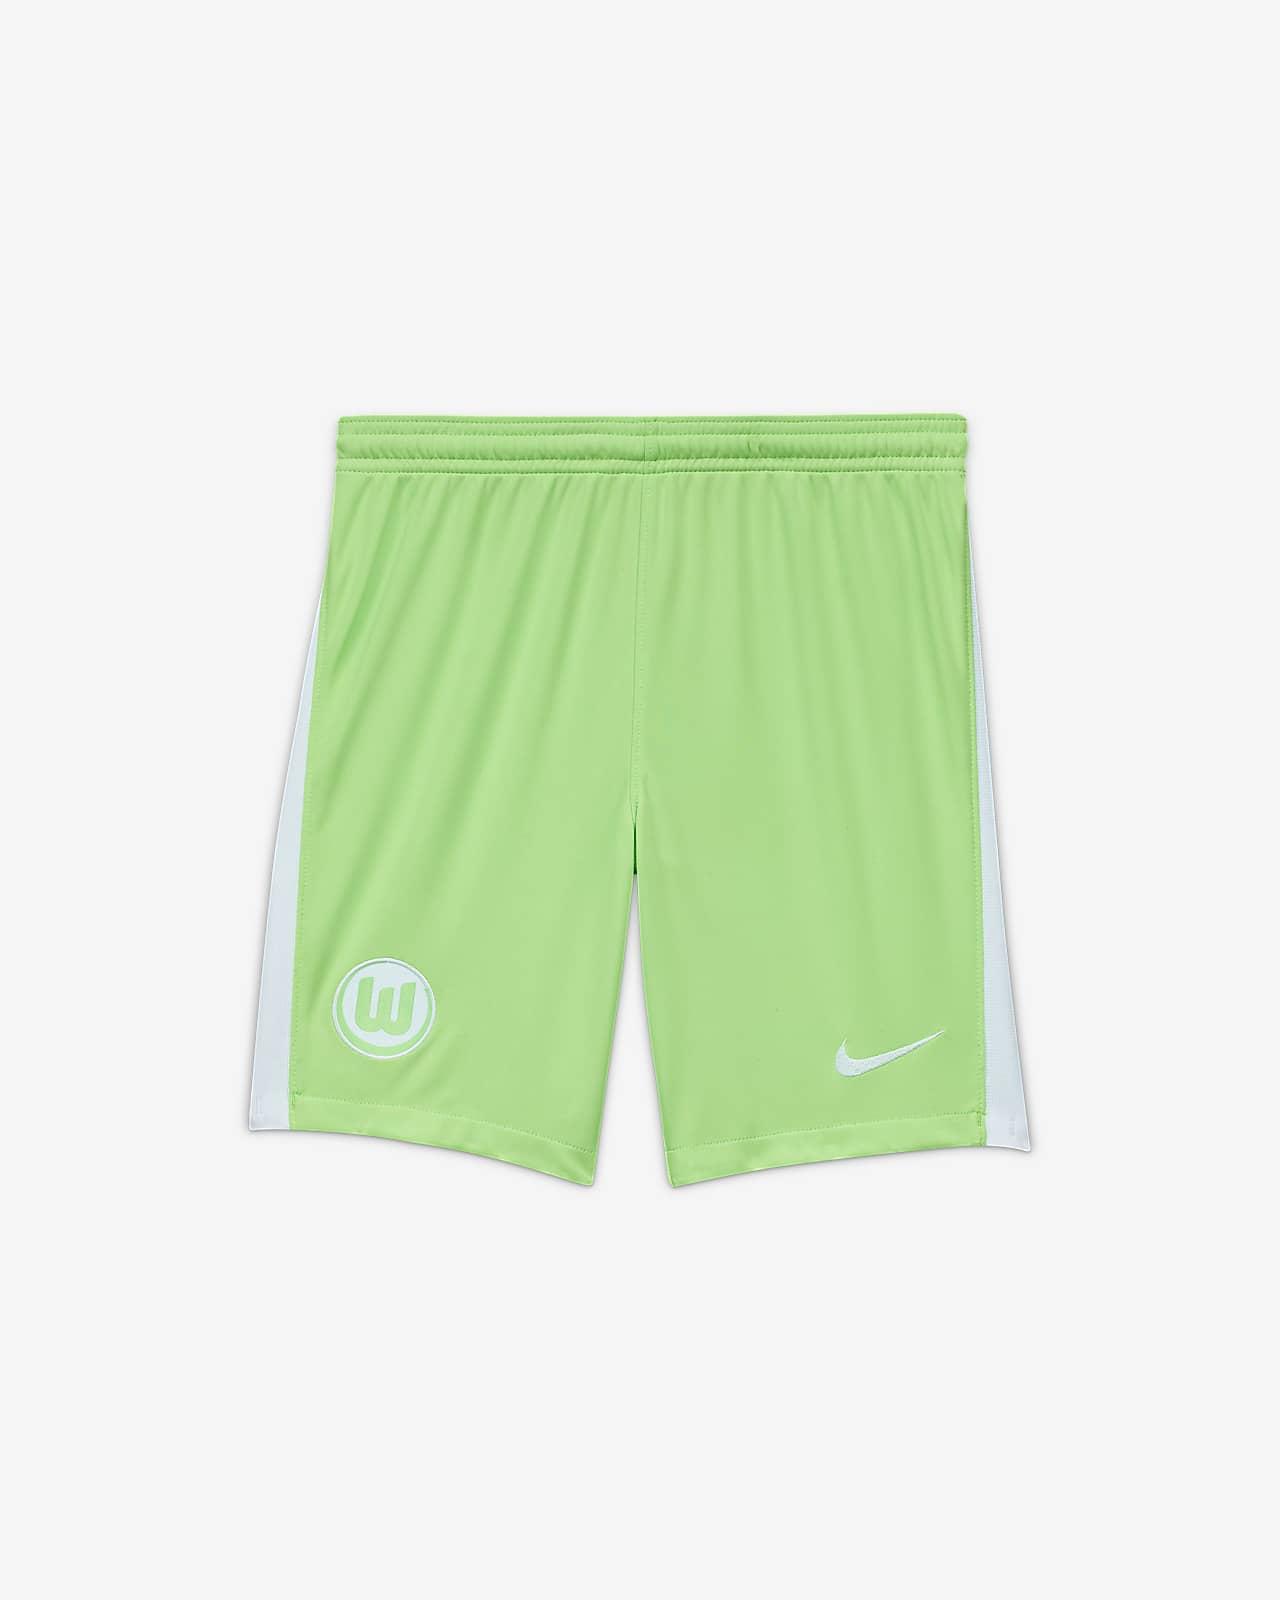 VfL Wolfsburg 2020/21 Stadium Home/Away Older Kids' Football Shorts